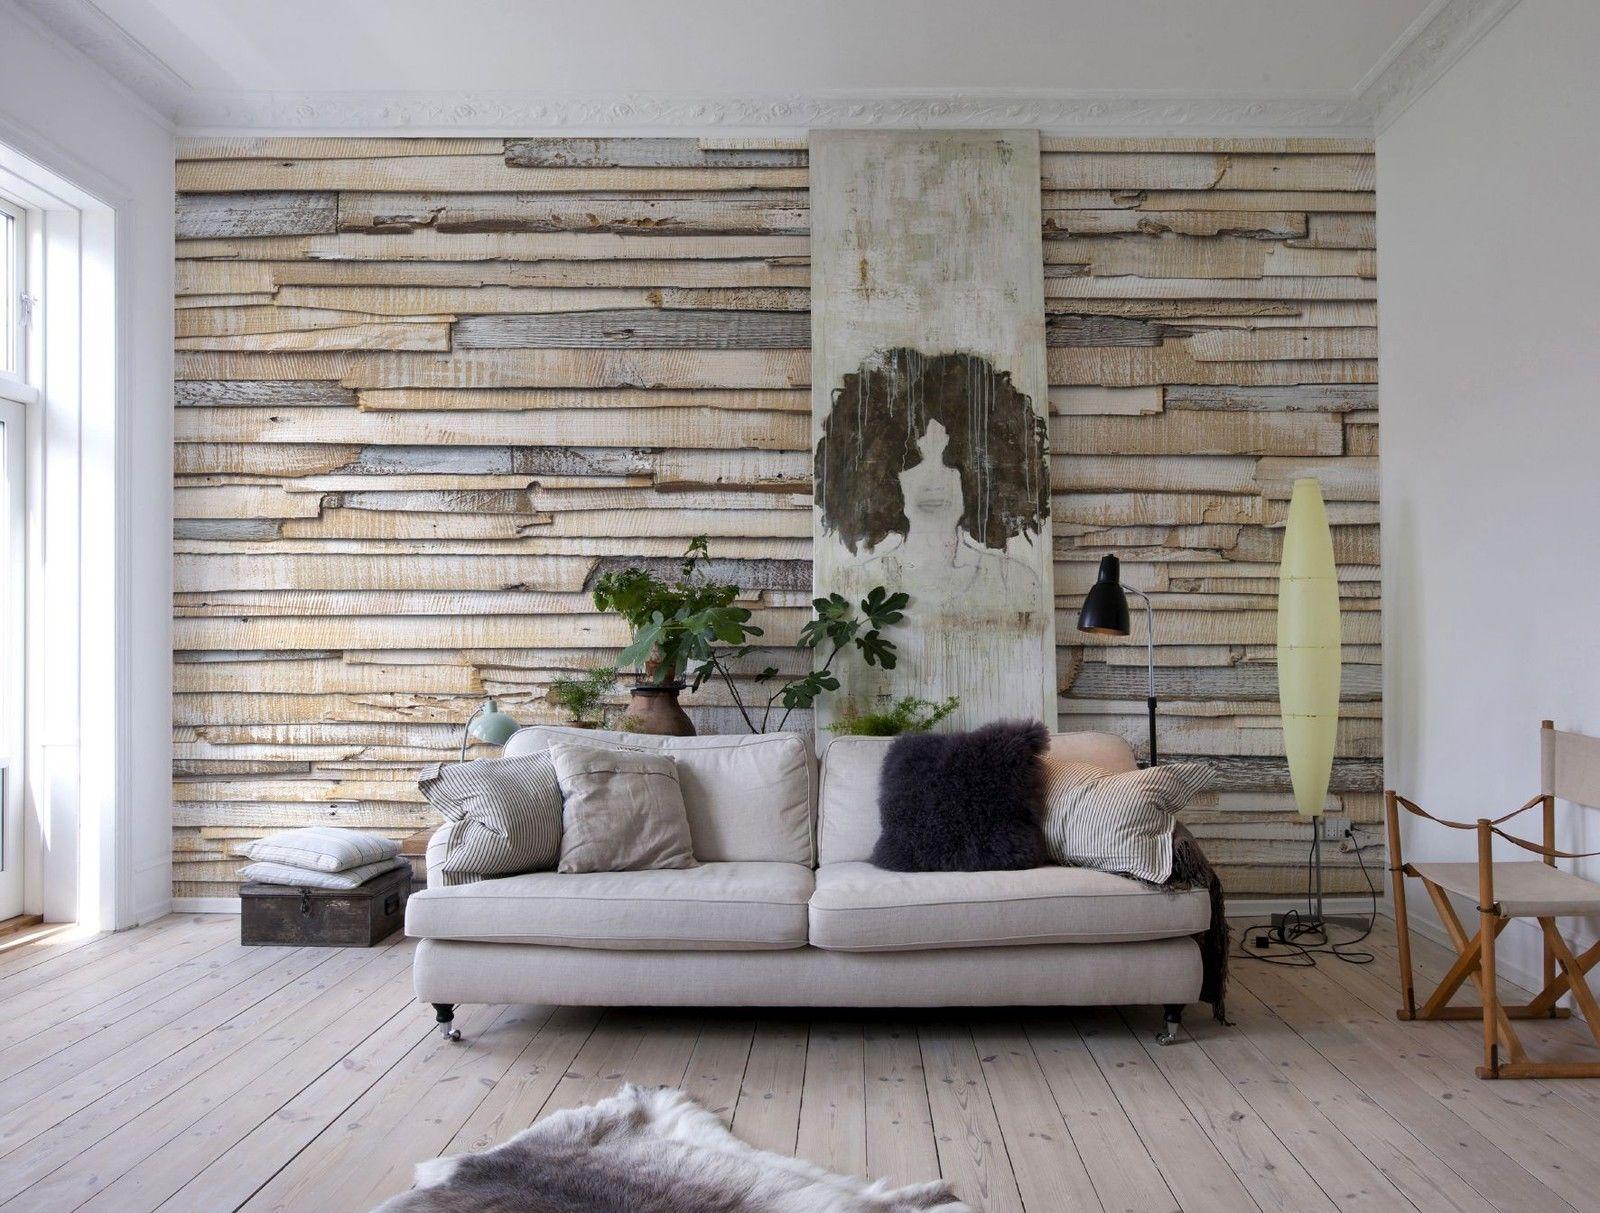 fototapete whitewashed wood 368x254 helle bretterwand gesagtes brewster home fashions komar white washed wall mural